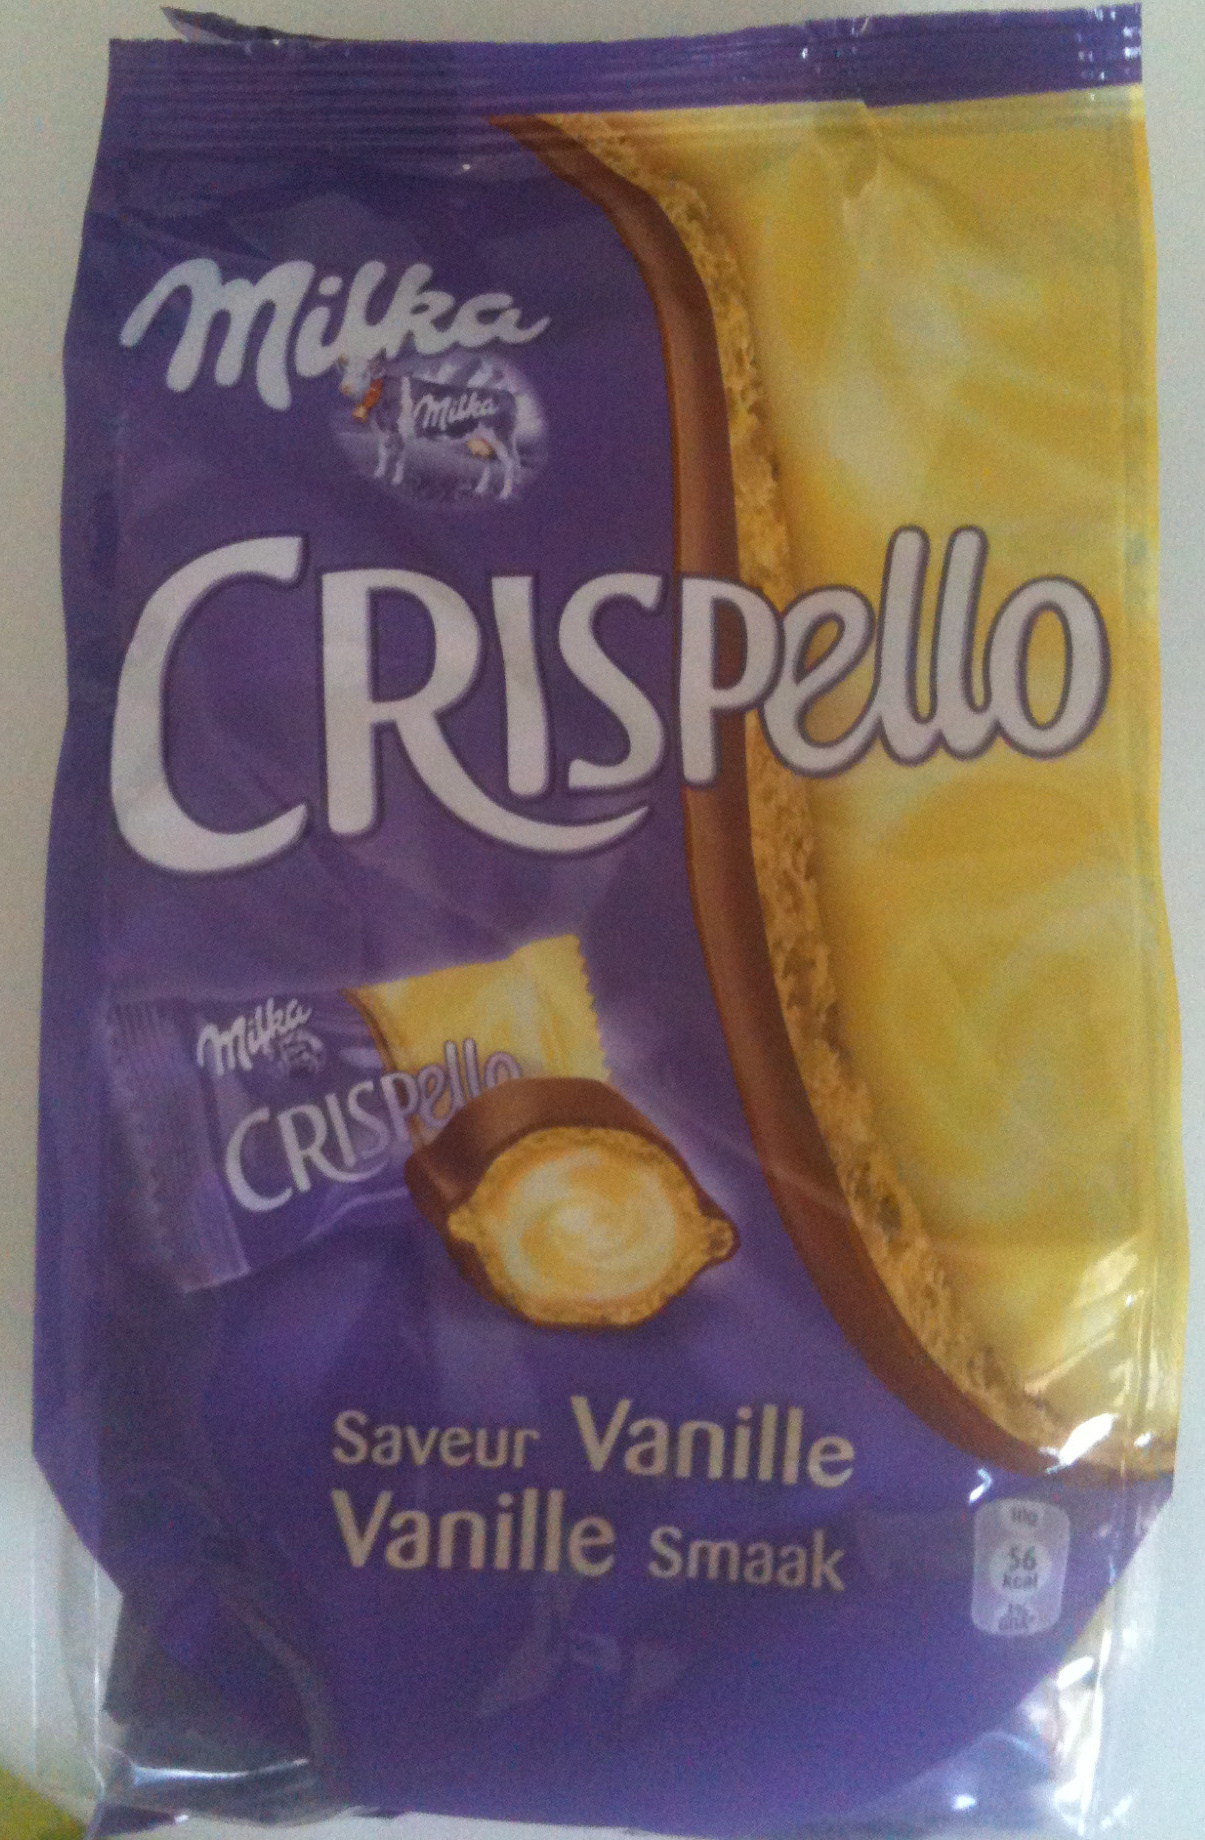 Milka - Crispello - Saveur Vanille - Produit - fr